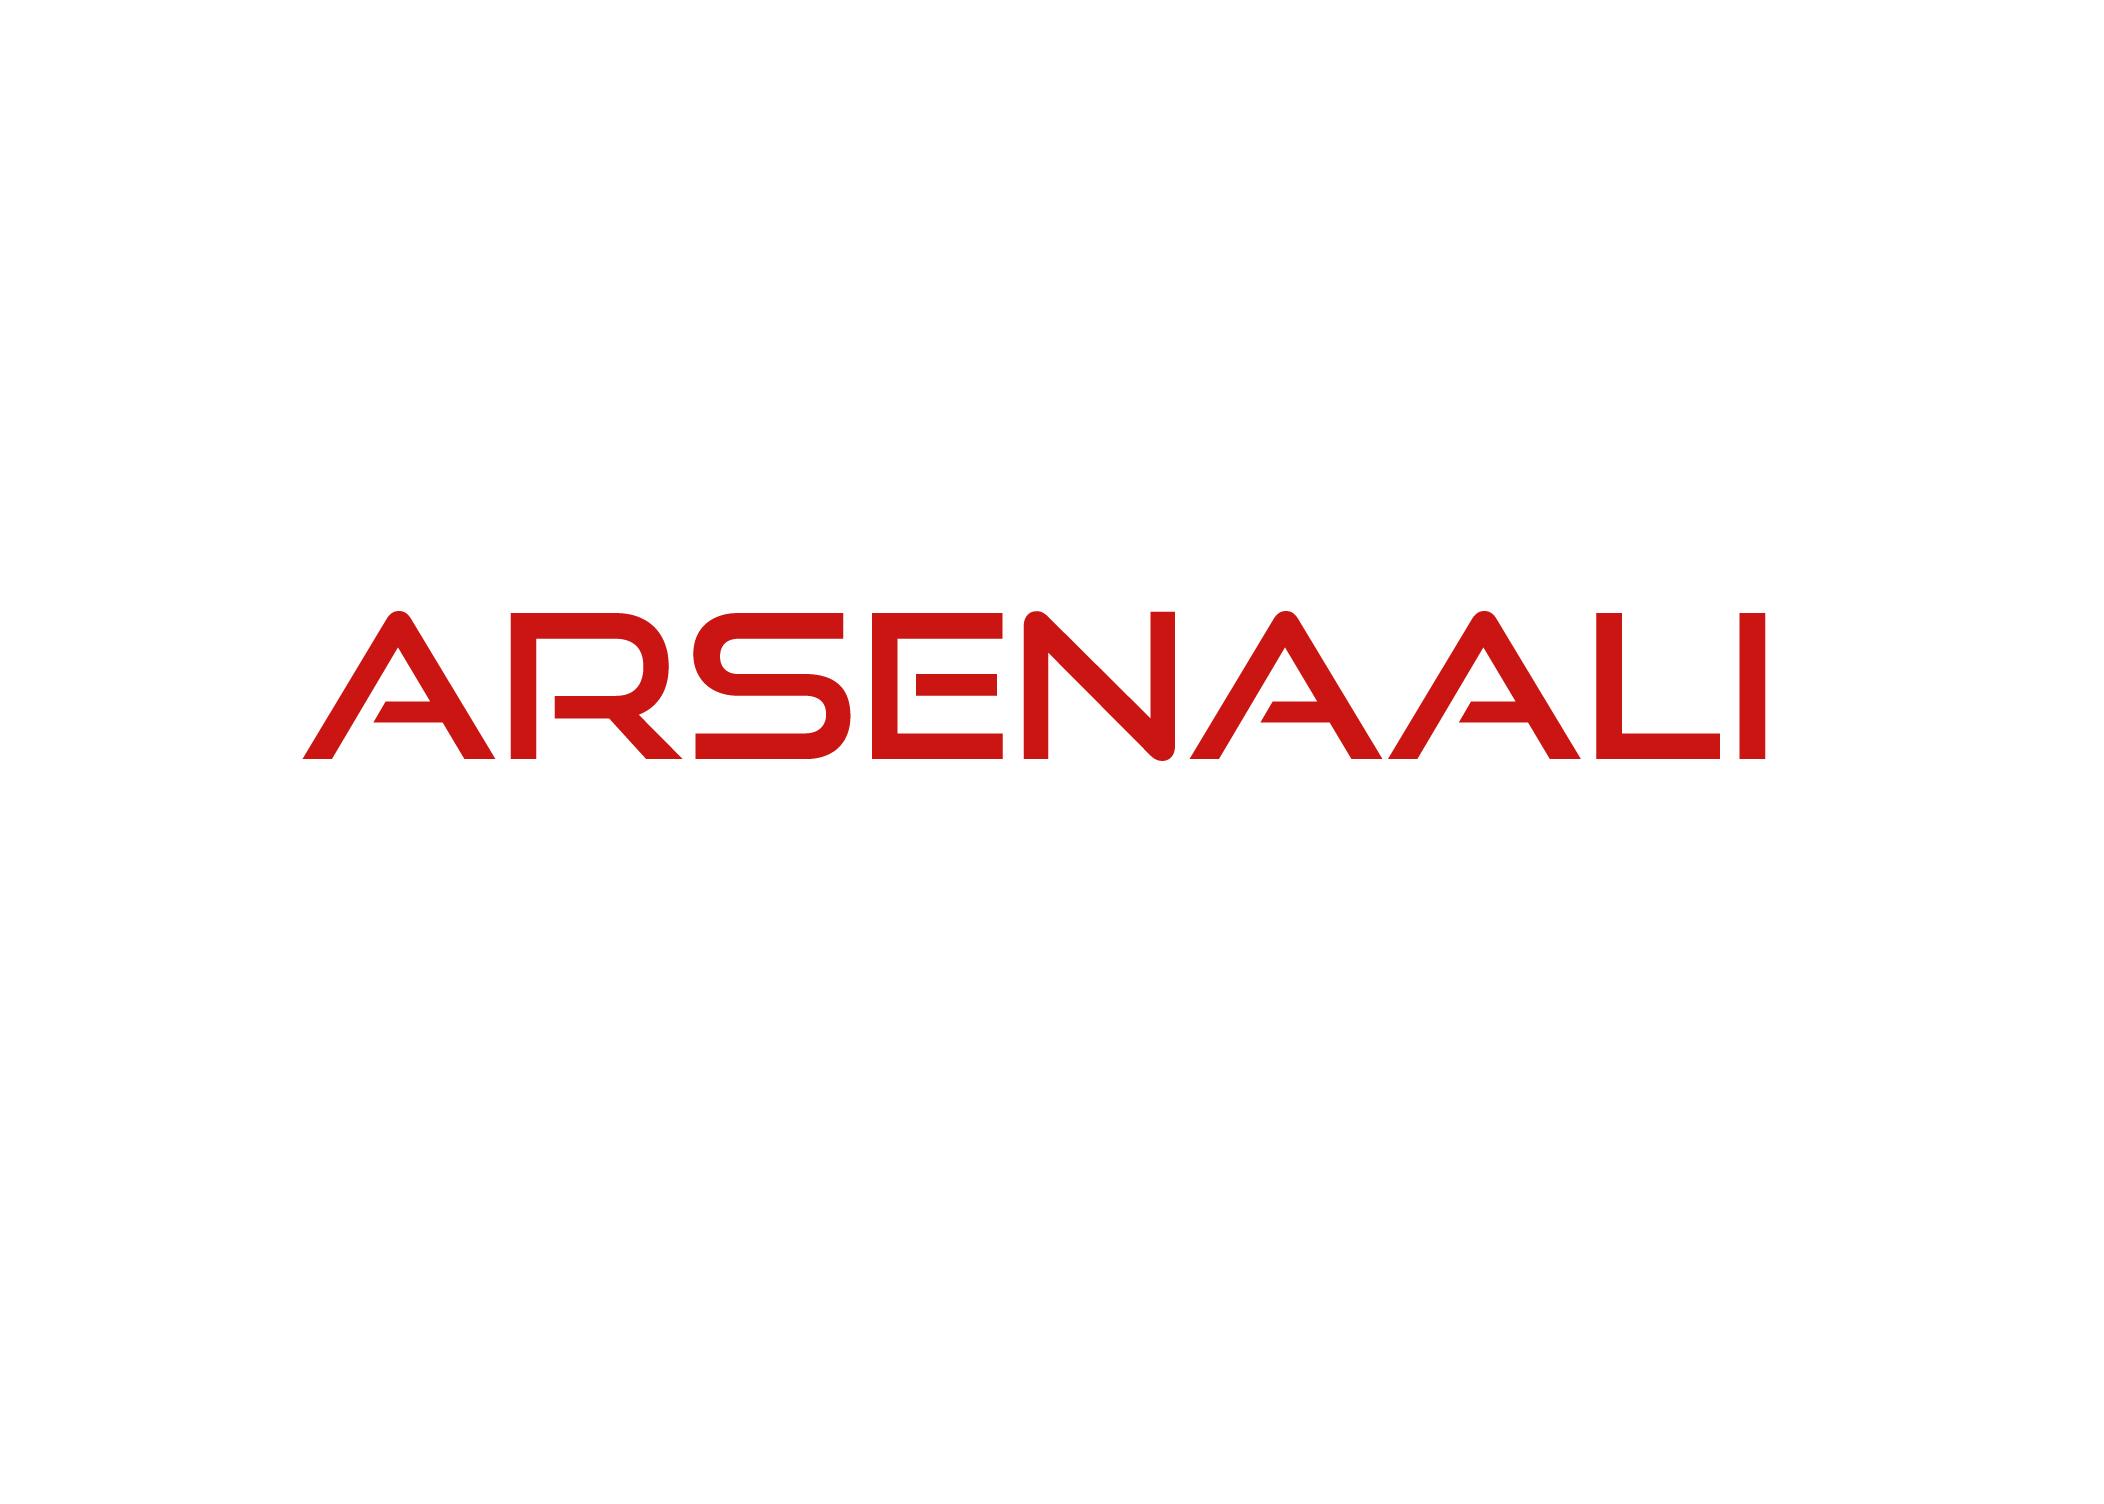 Arsenaali Oy logo